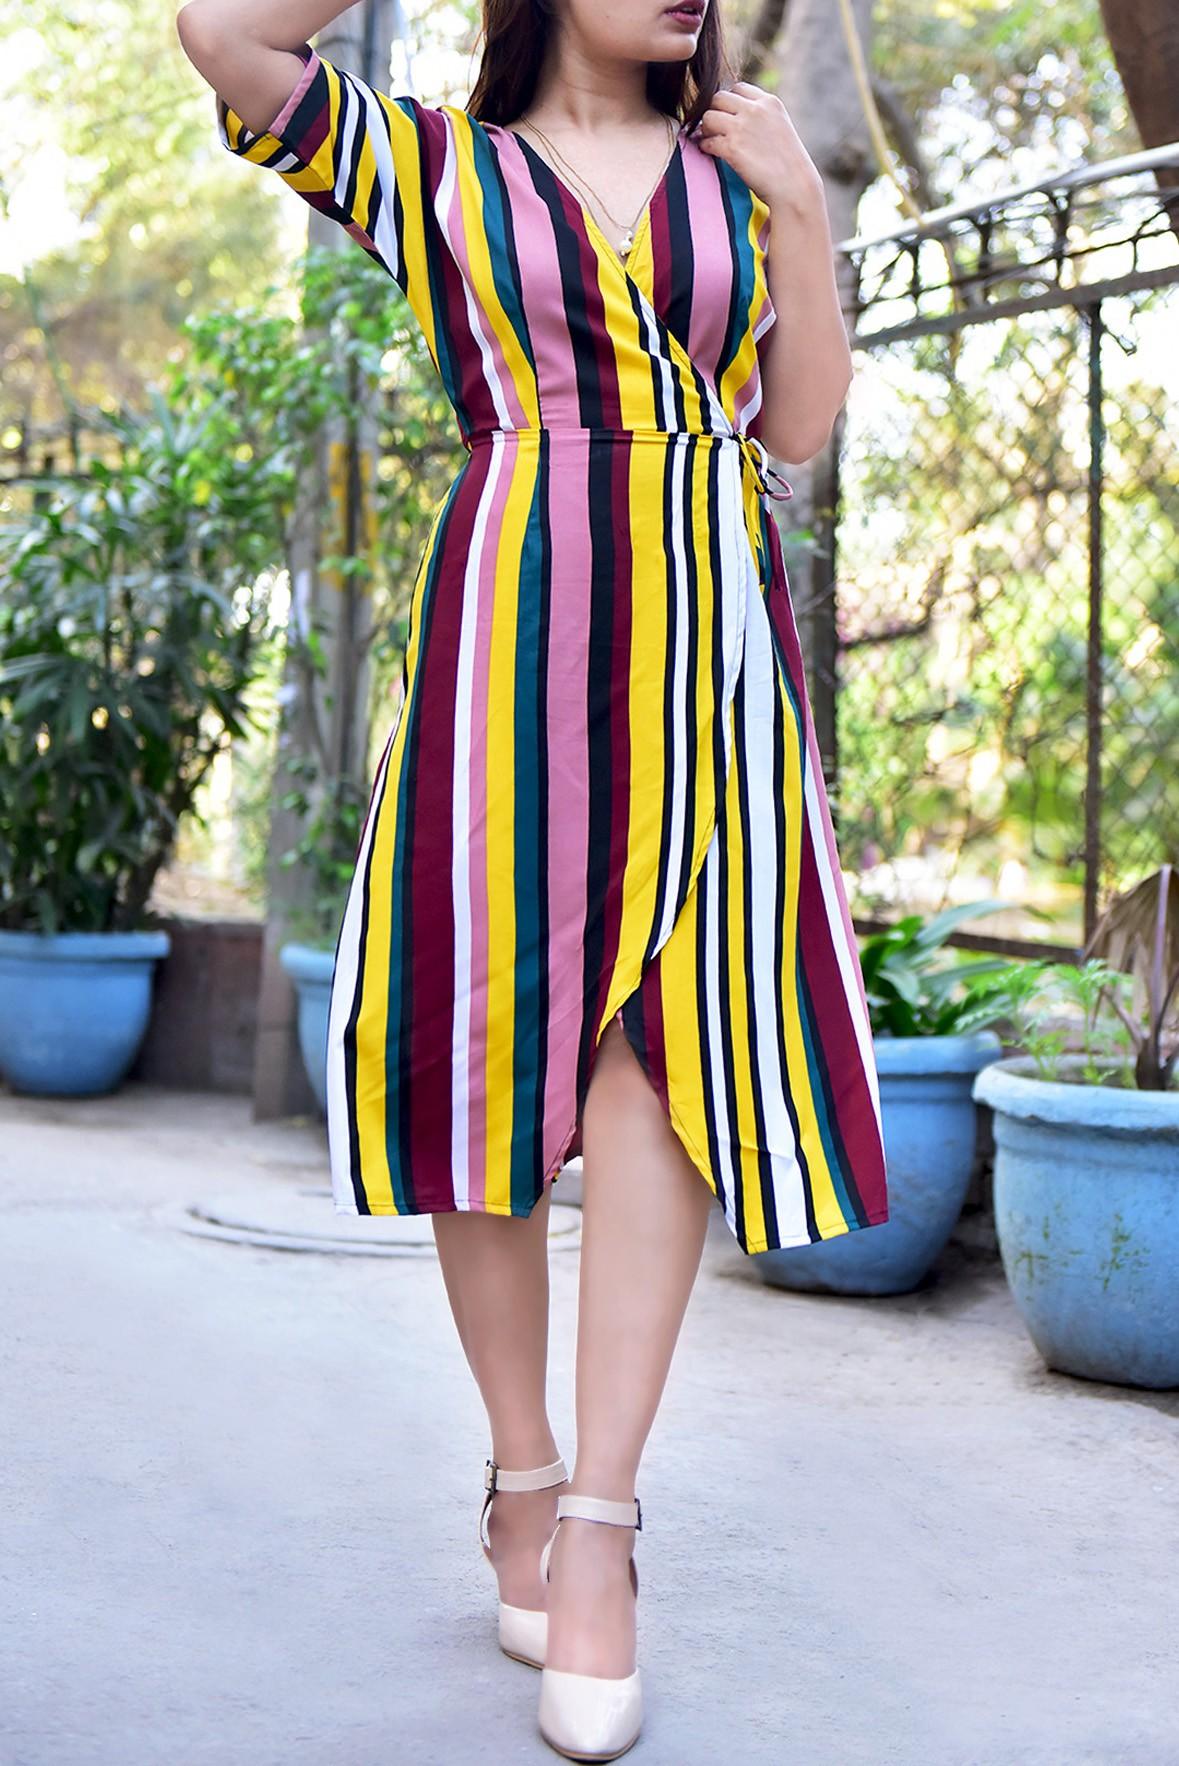 Conventional rainbow dress